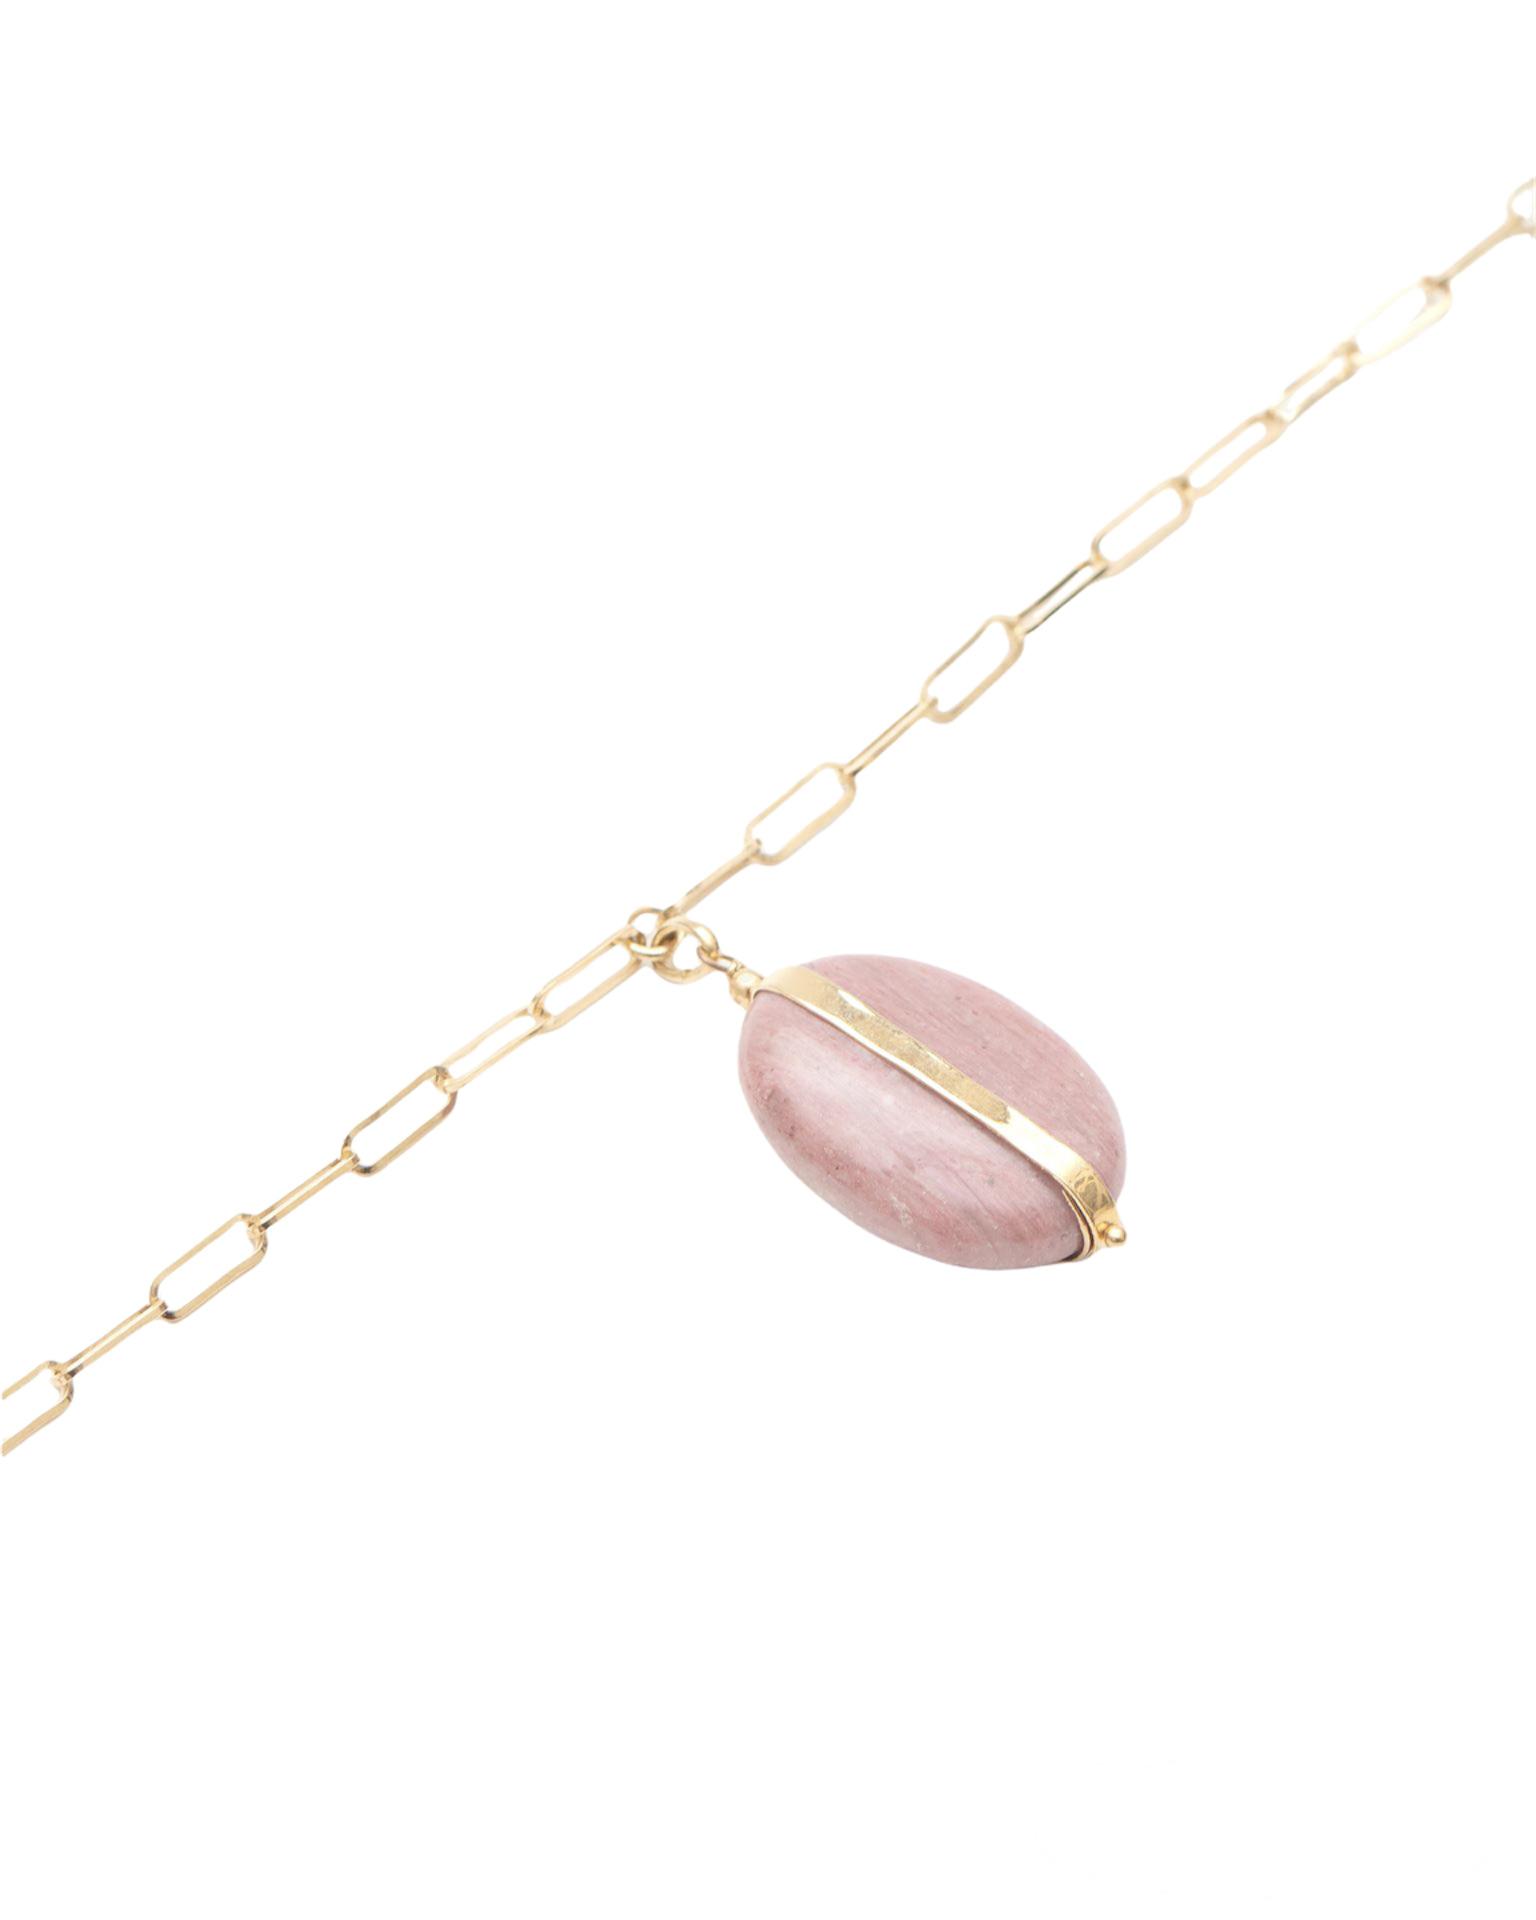 Halskette, Stones, Isabel Marant, Schmuck, CO0232-21A025B